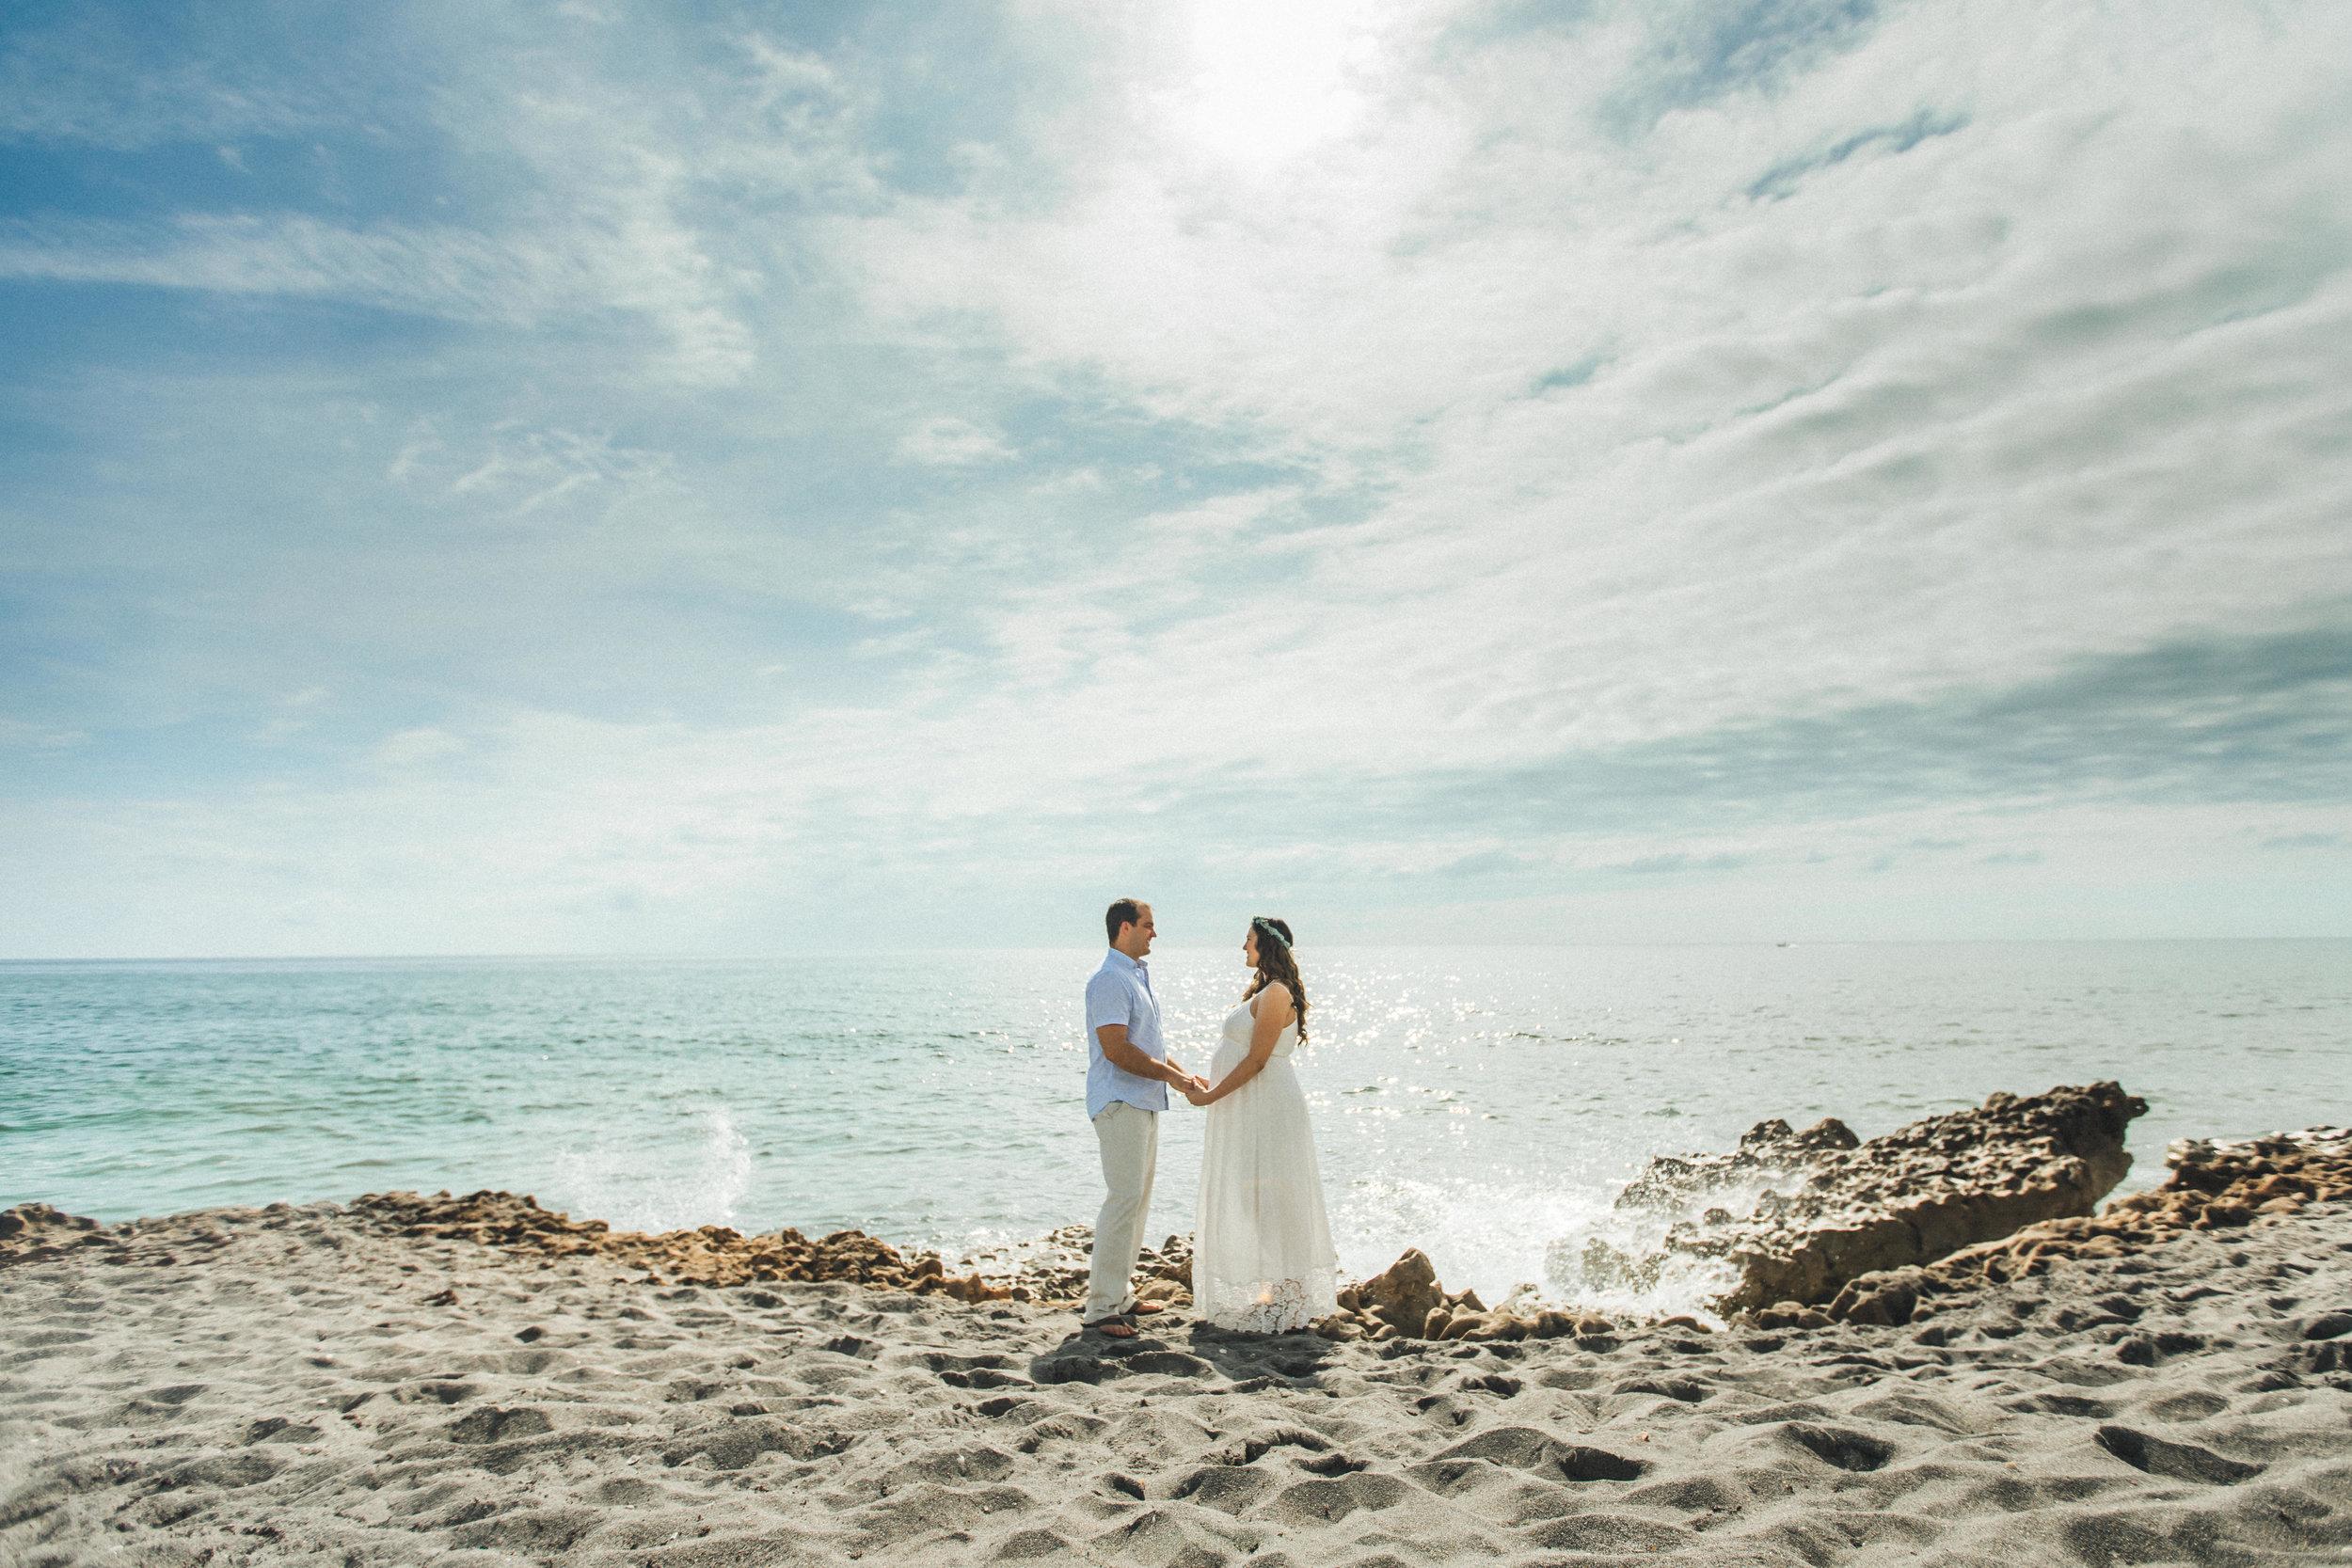 White Maternity Dress- Erica + Aaron's Blowing Rock Preserve- Florida Maternity Photos-65.jpg